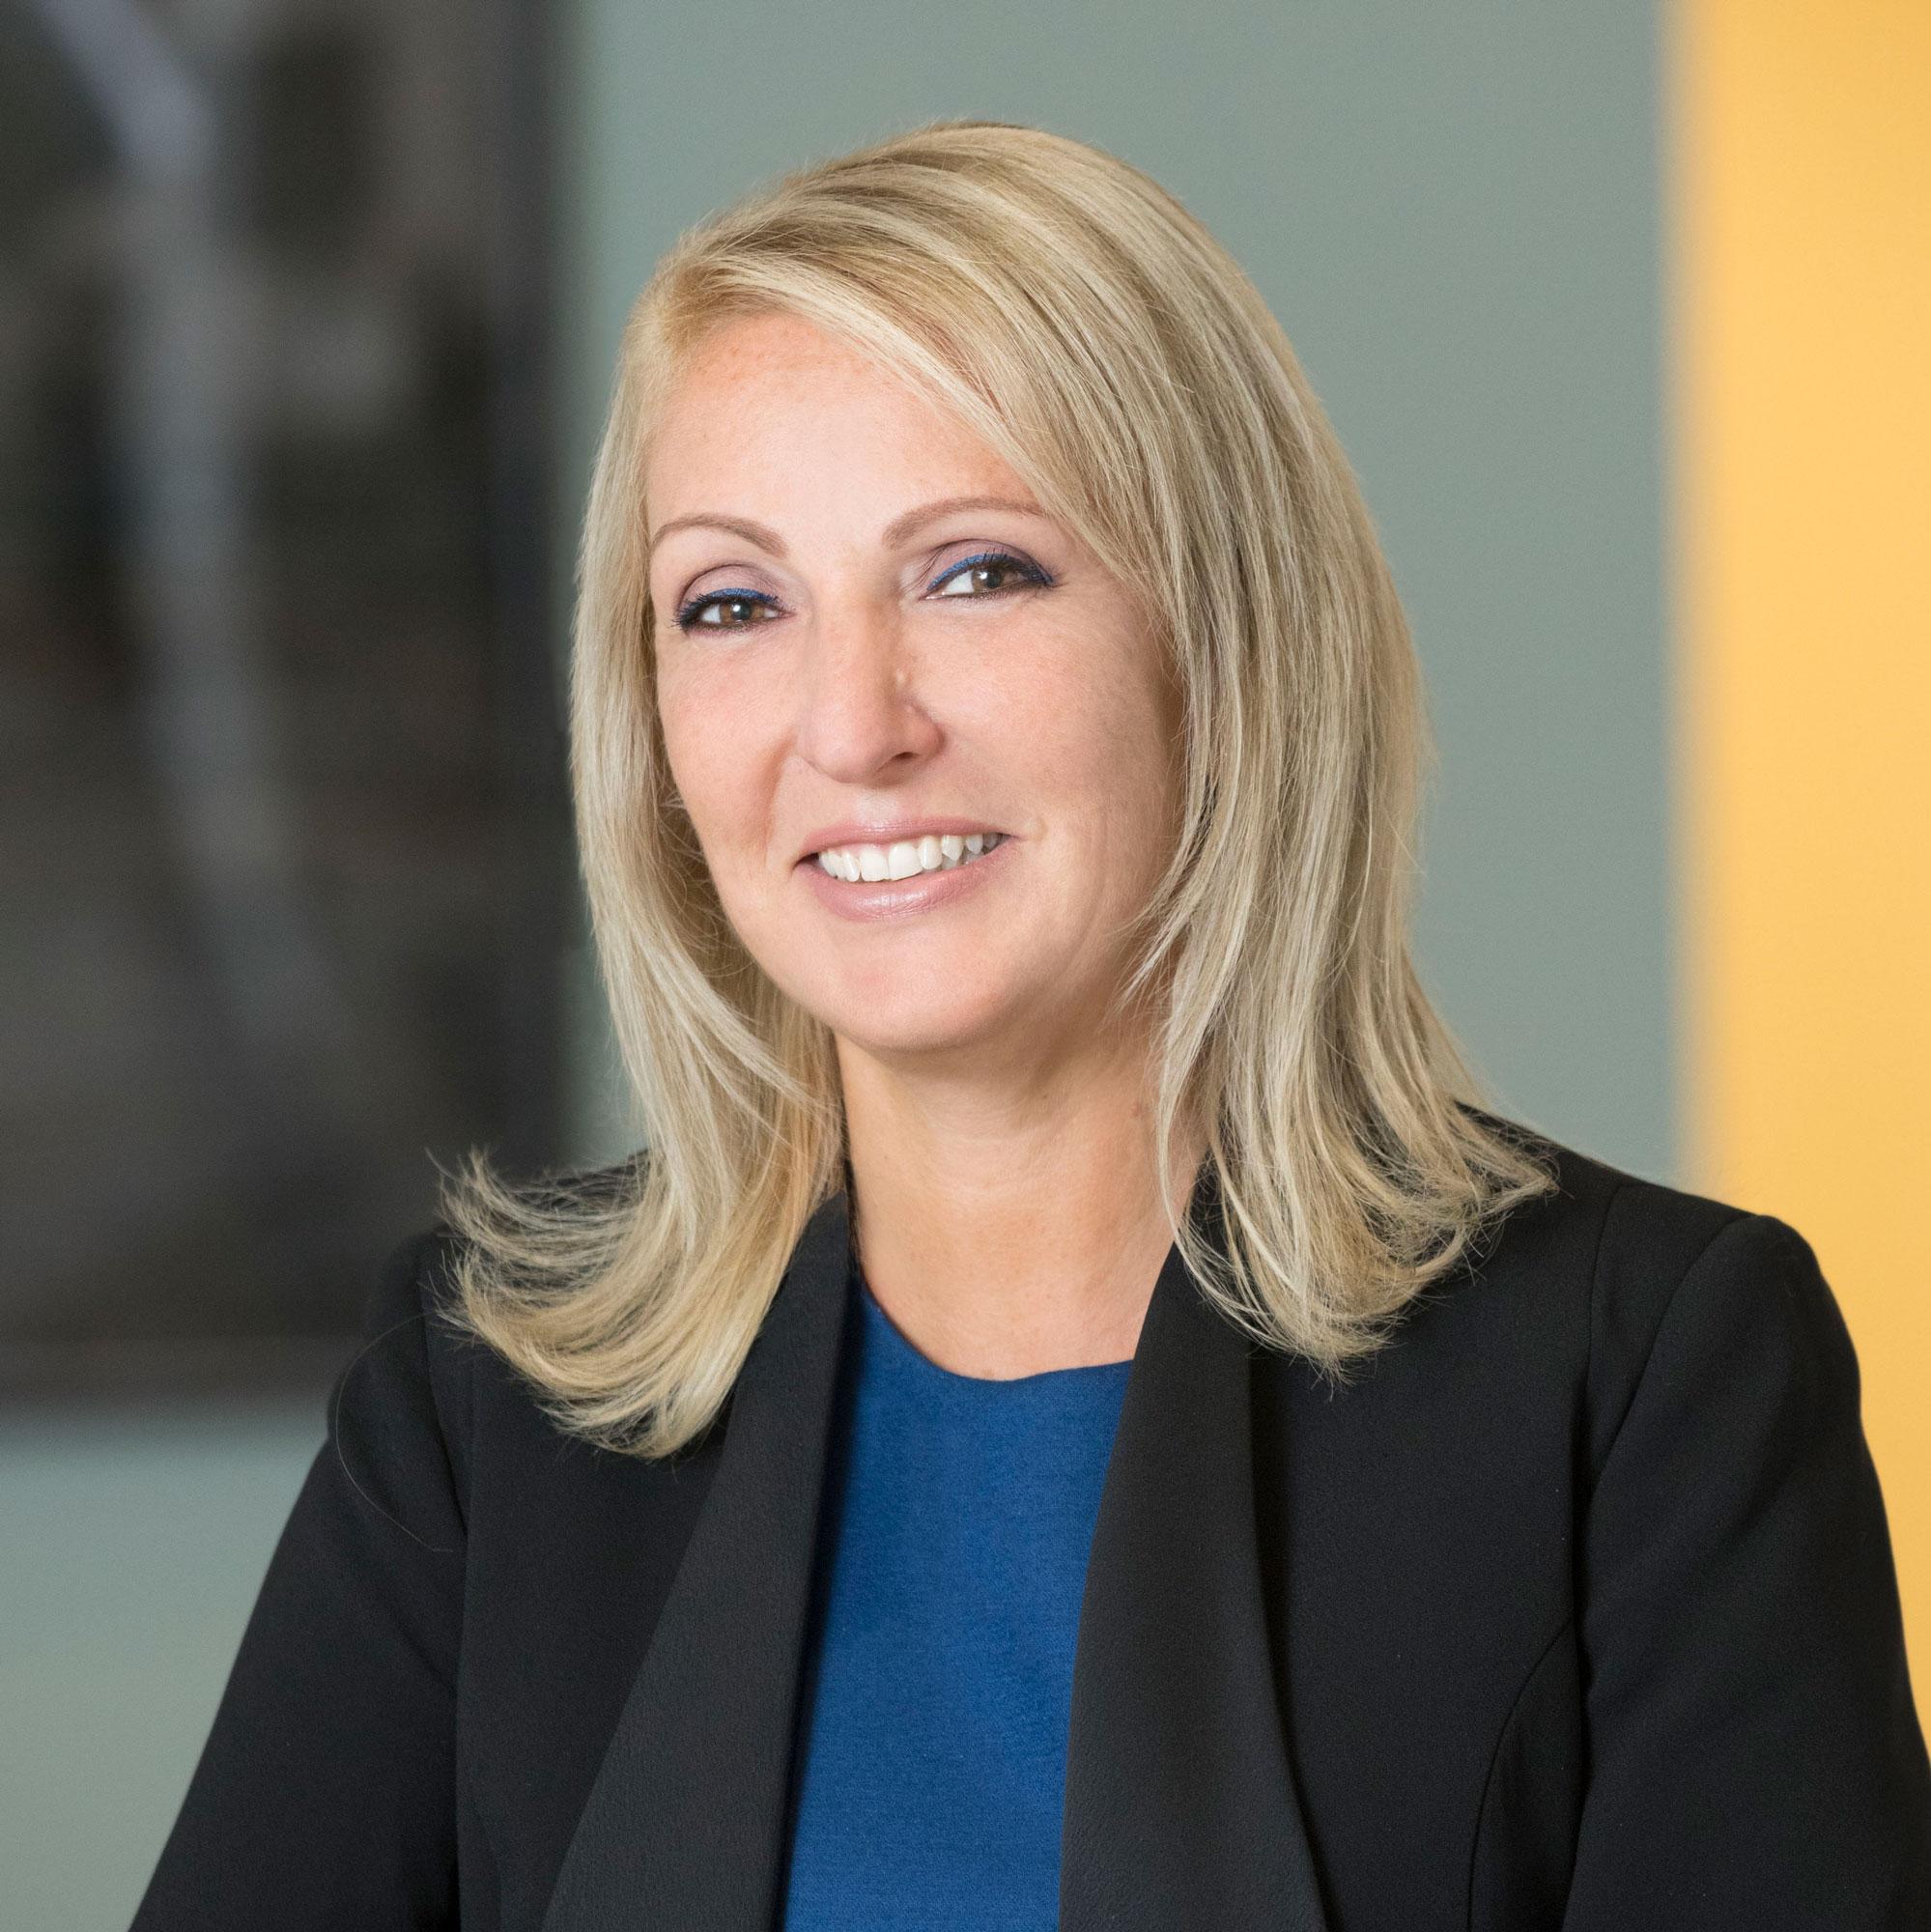 Corporate portrait of Sharon Ladiapalo